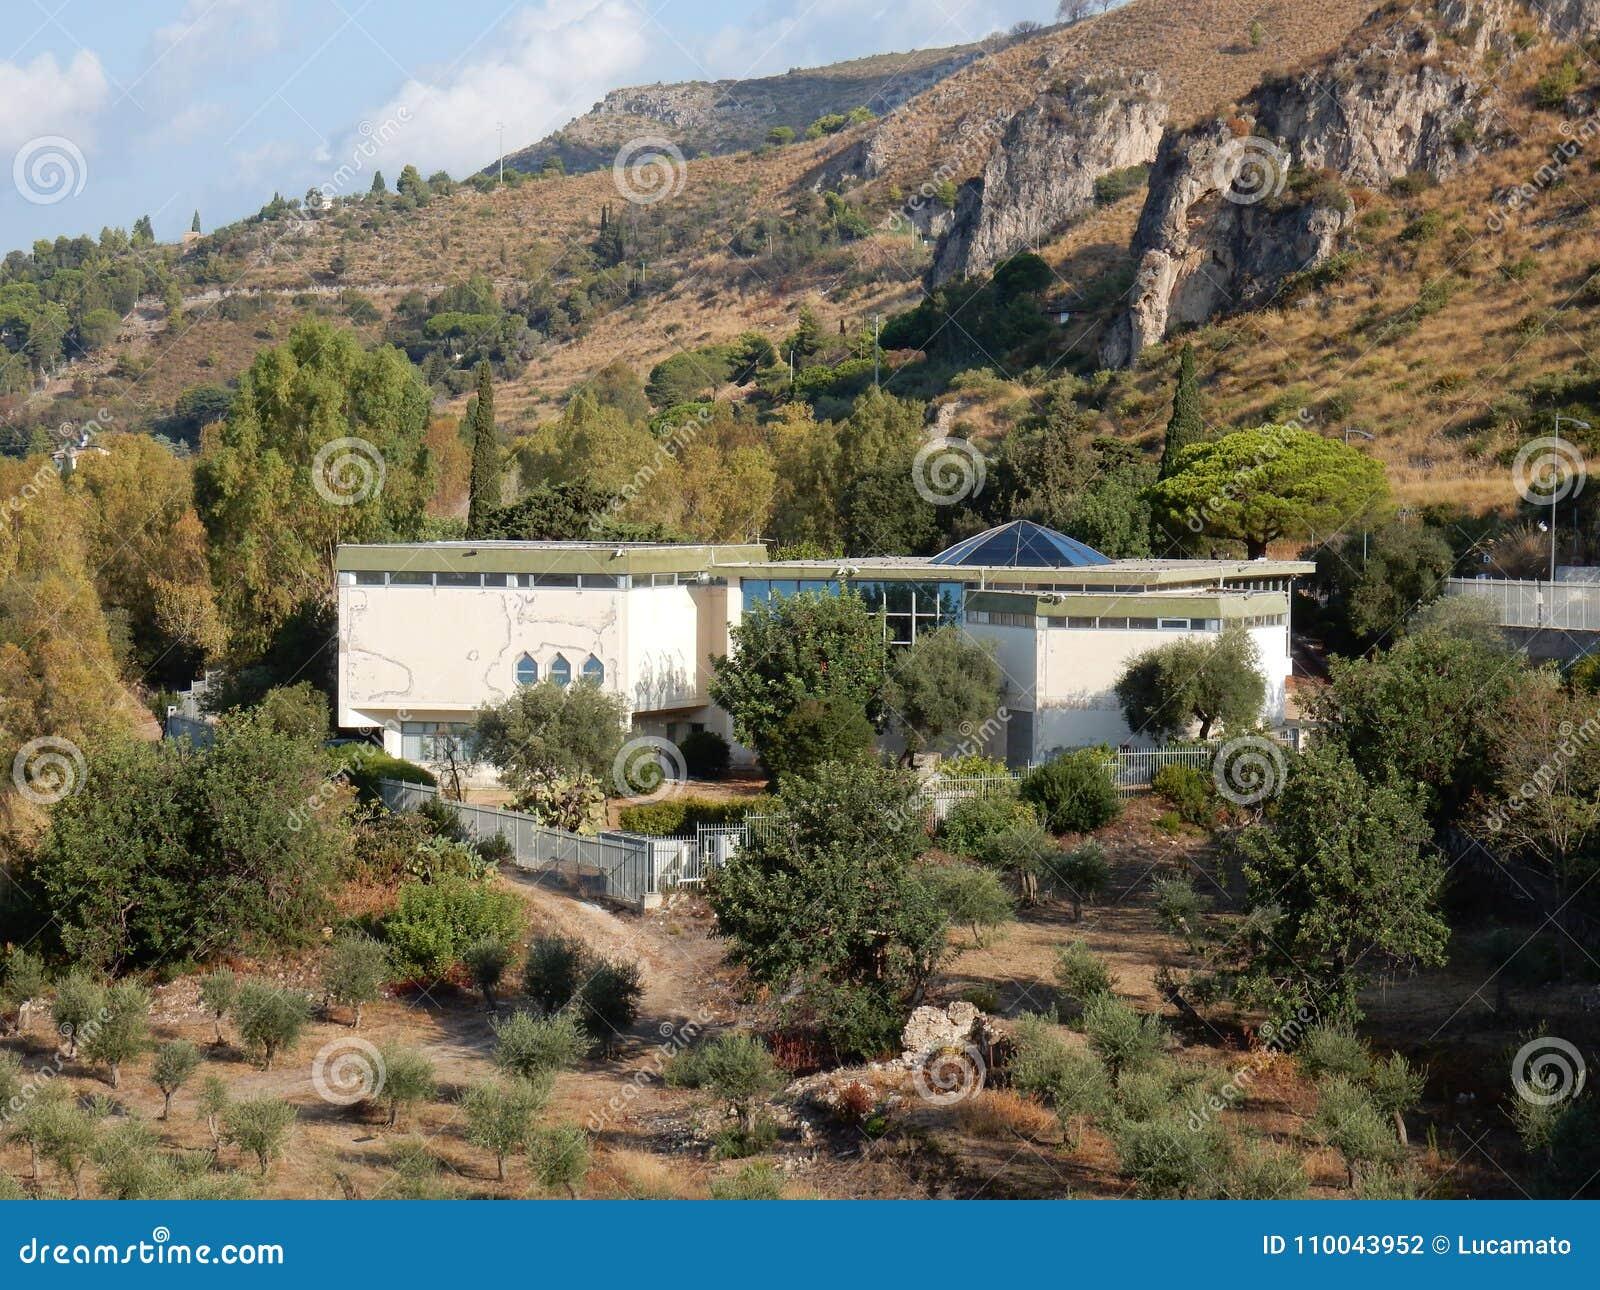 Sperlonga - Archeologisch Museum van Ulysses Trail